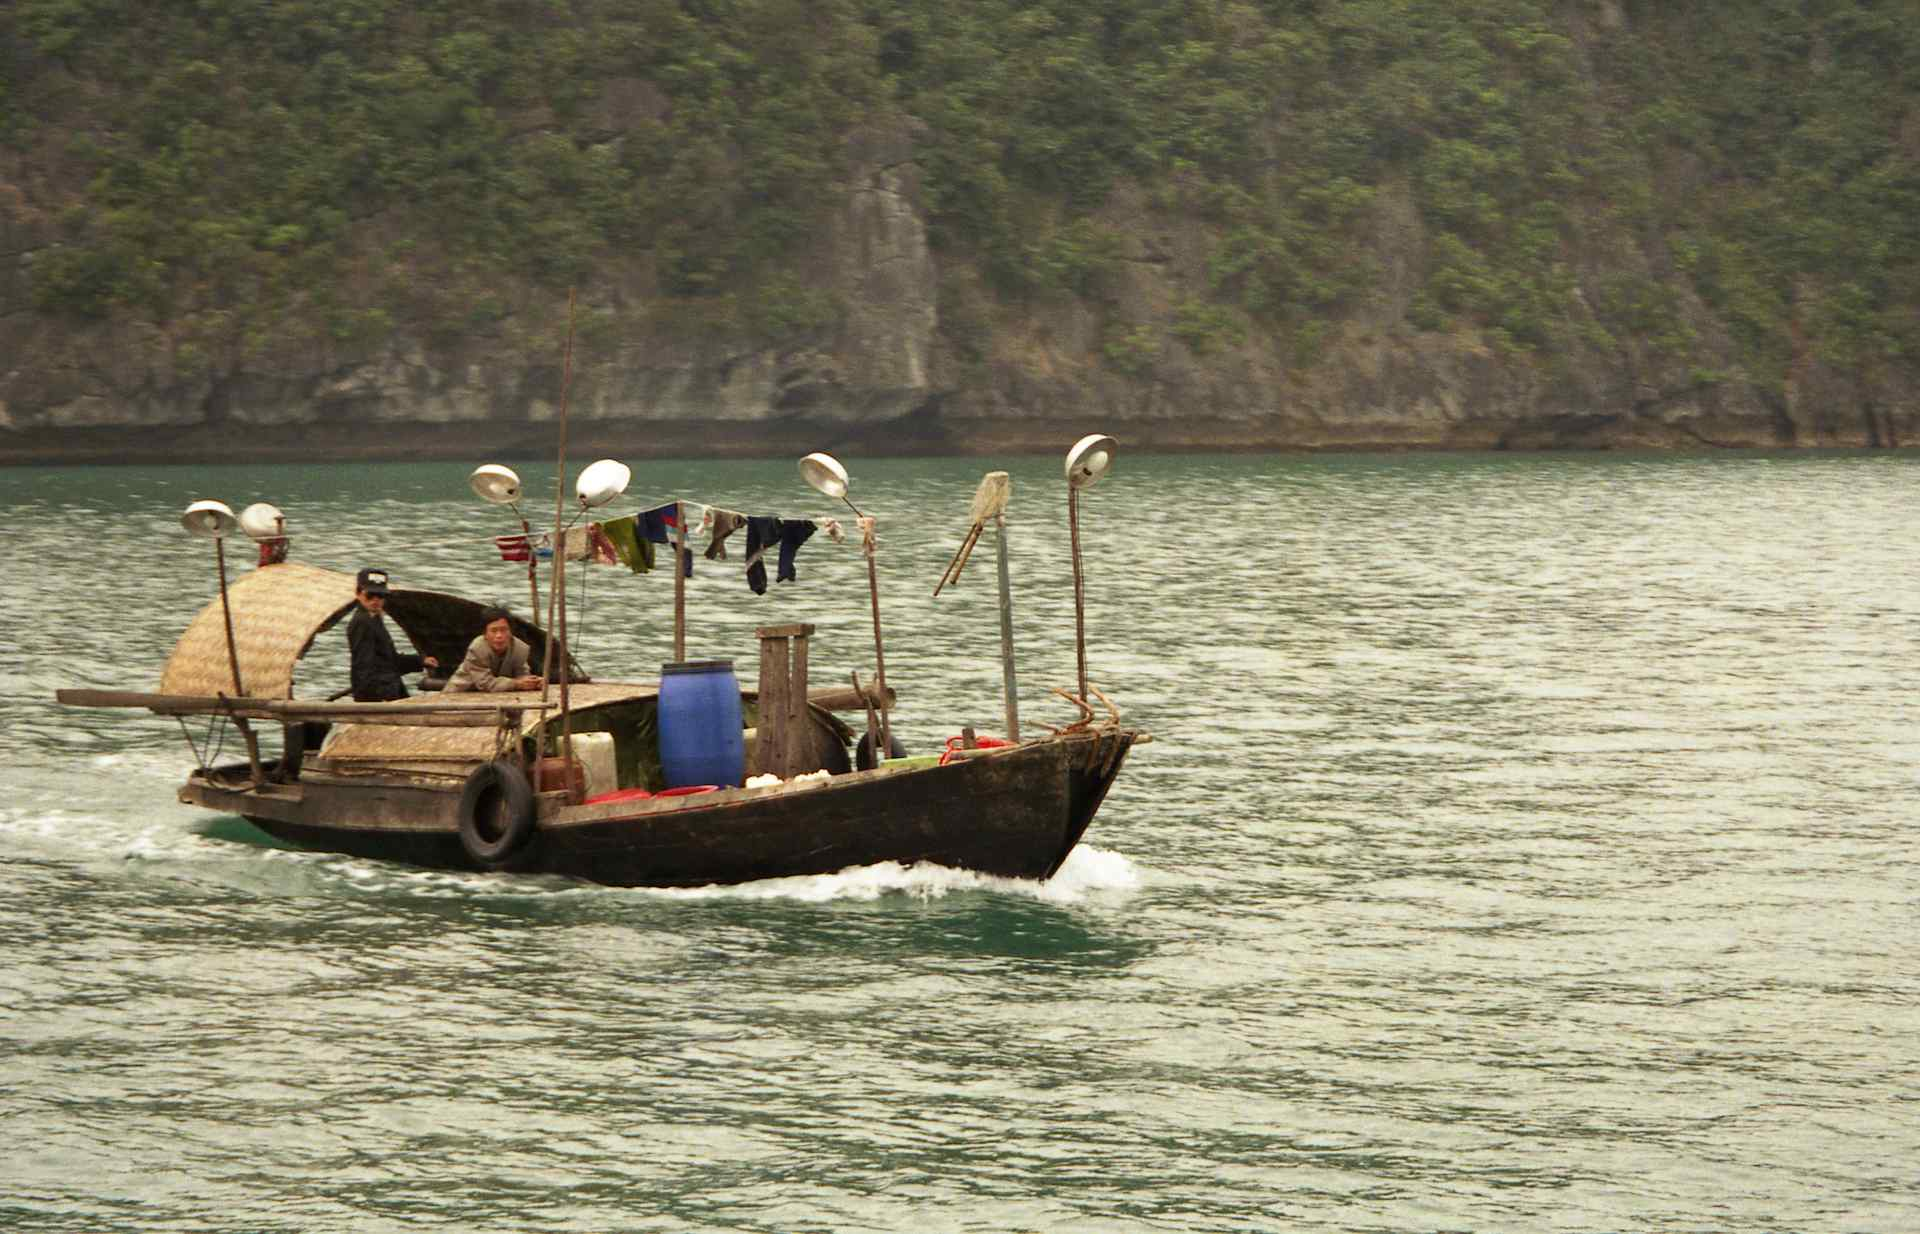 Fishing boat with lights halong bay vietnam fishing for Fishing boat lights